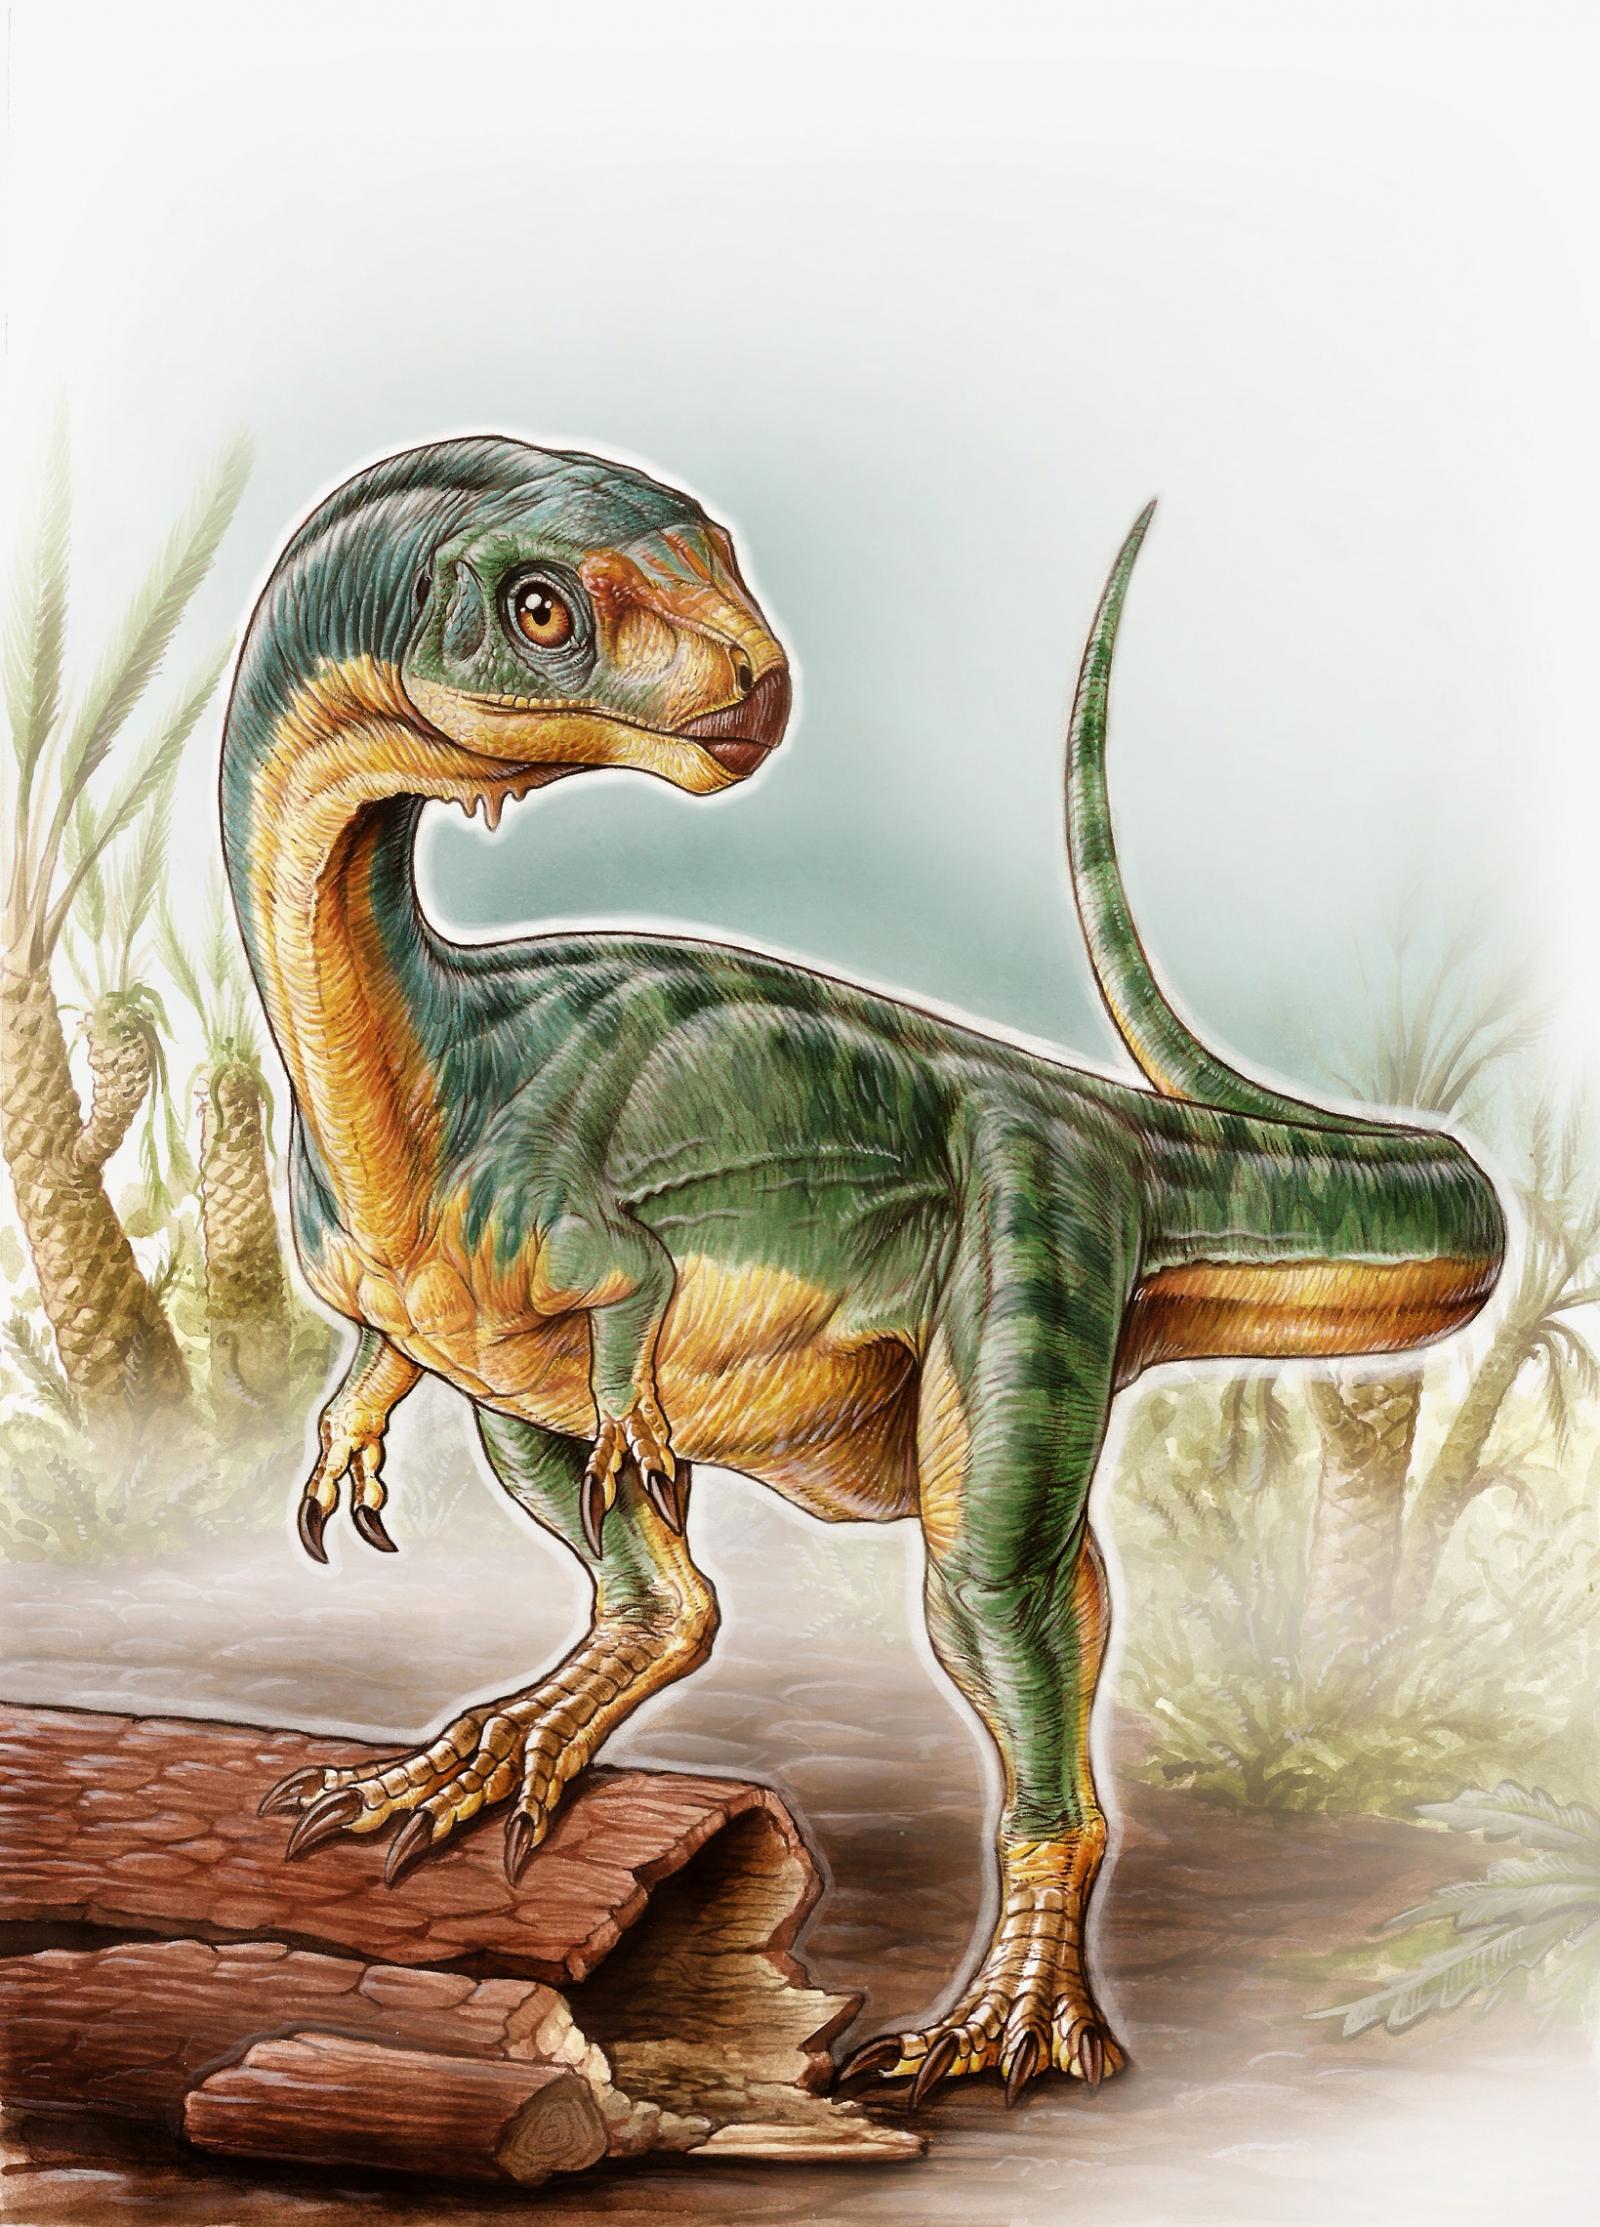 Chilesaurus dinosaur